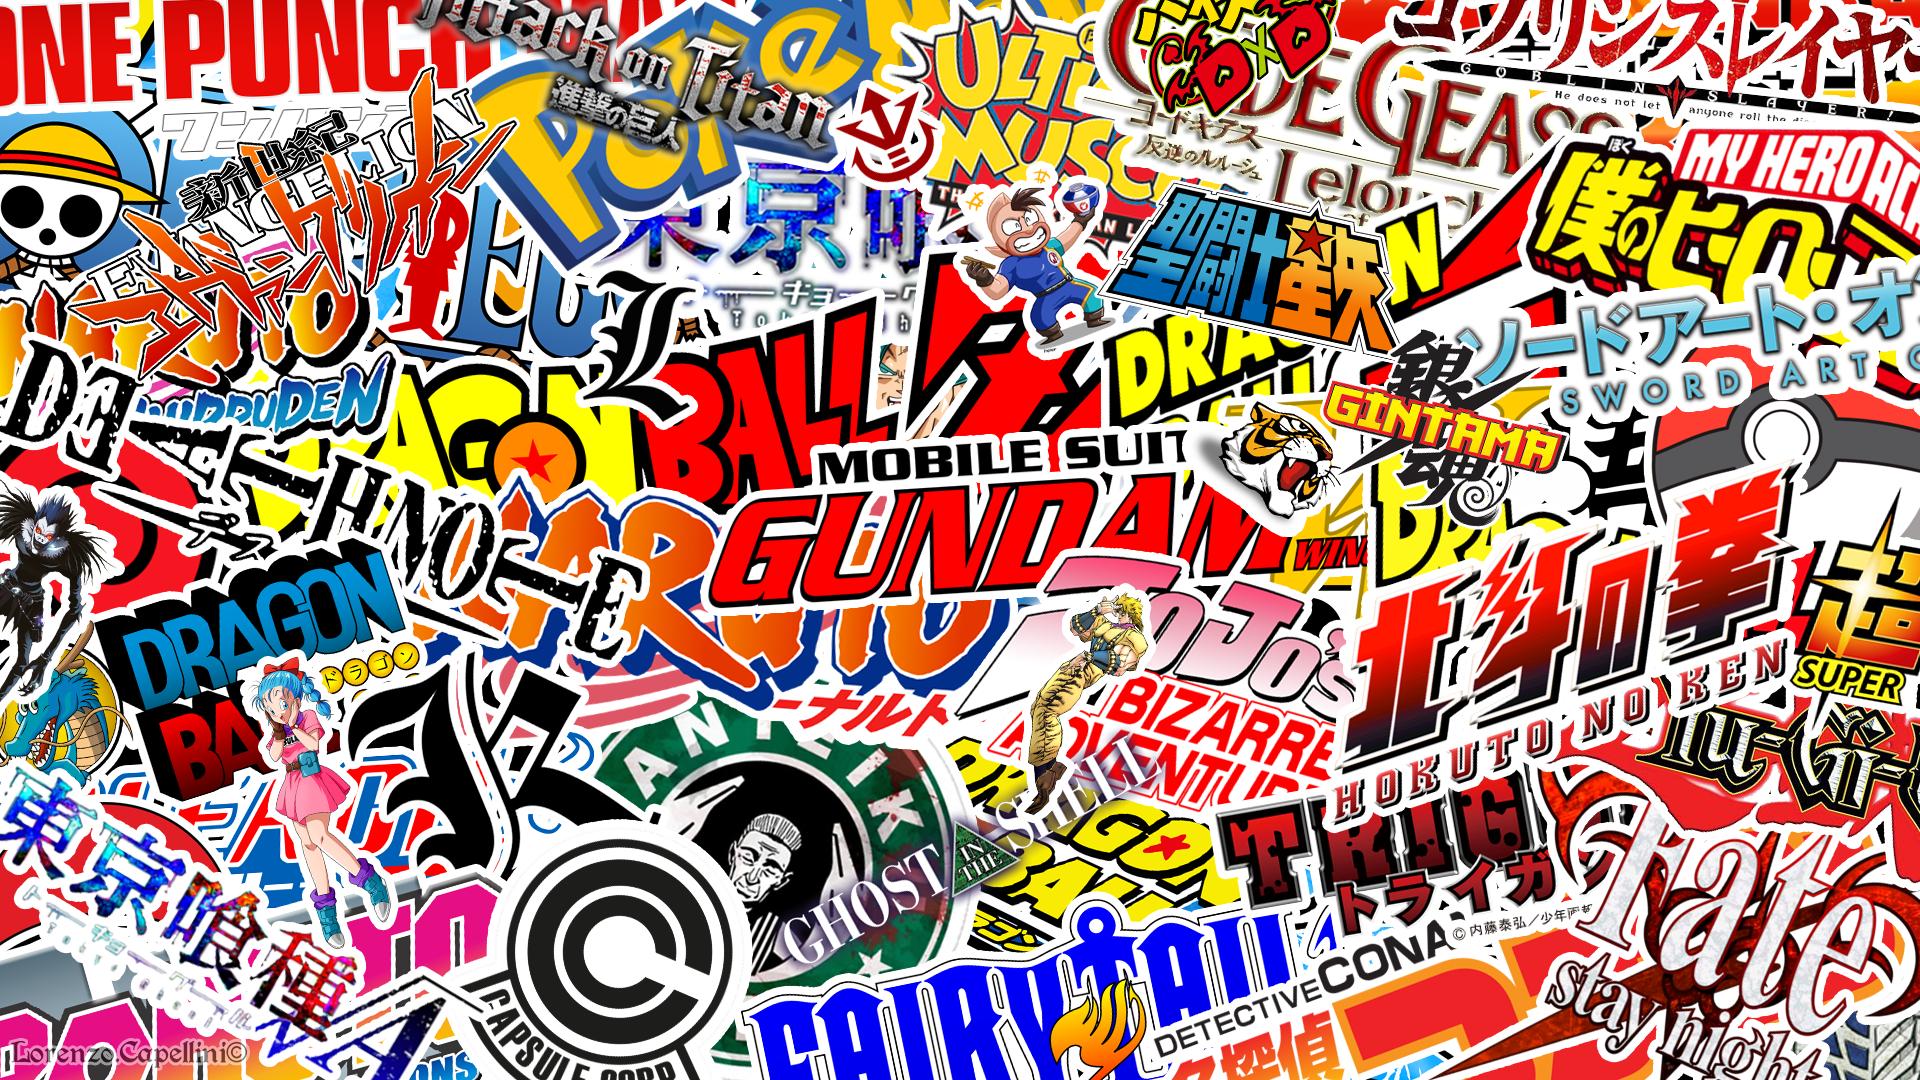 Anime logos Wallpaper sticker bomb style 19201080 Animewallpaper 1920x1080